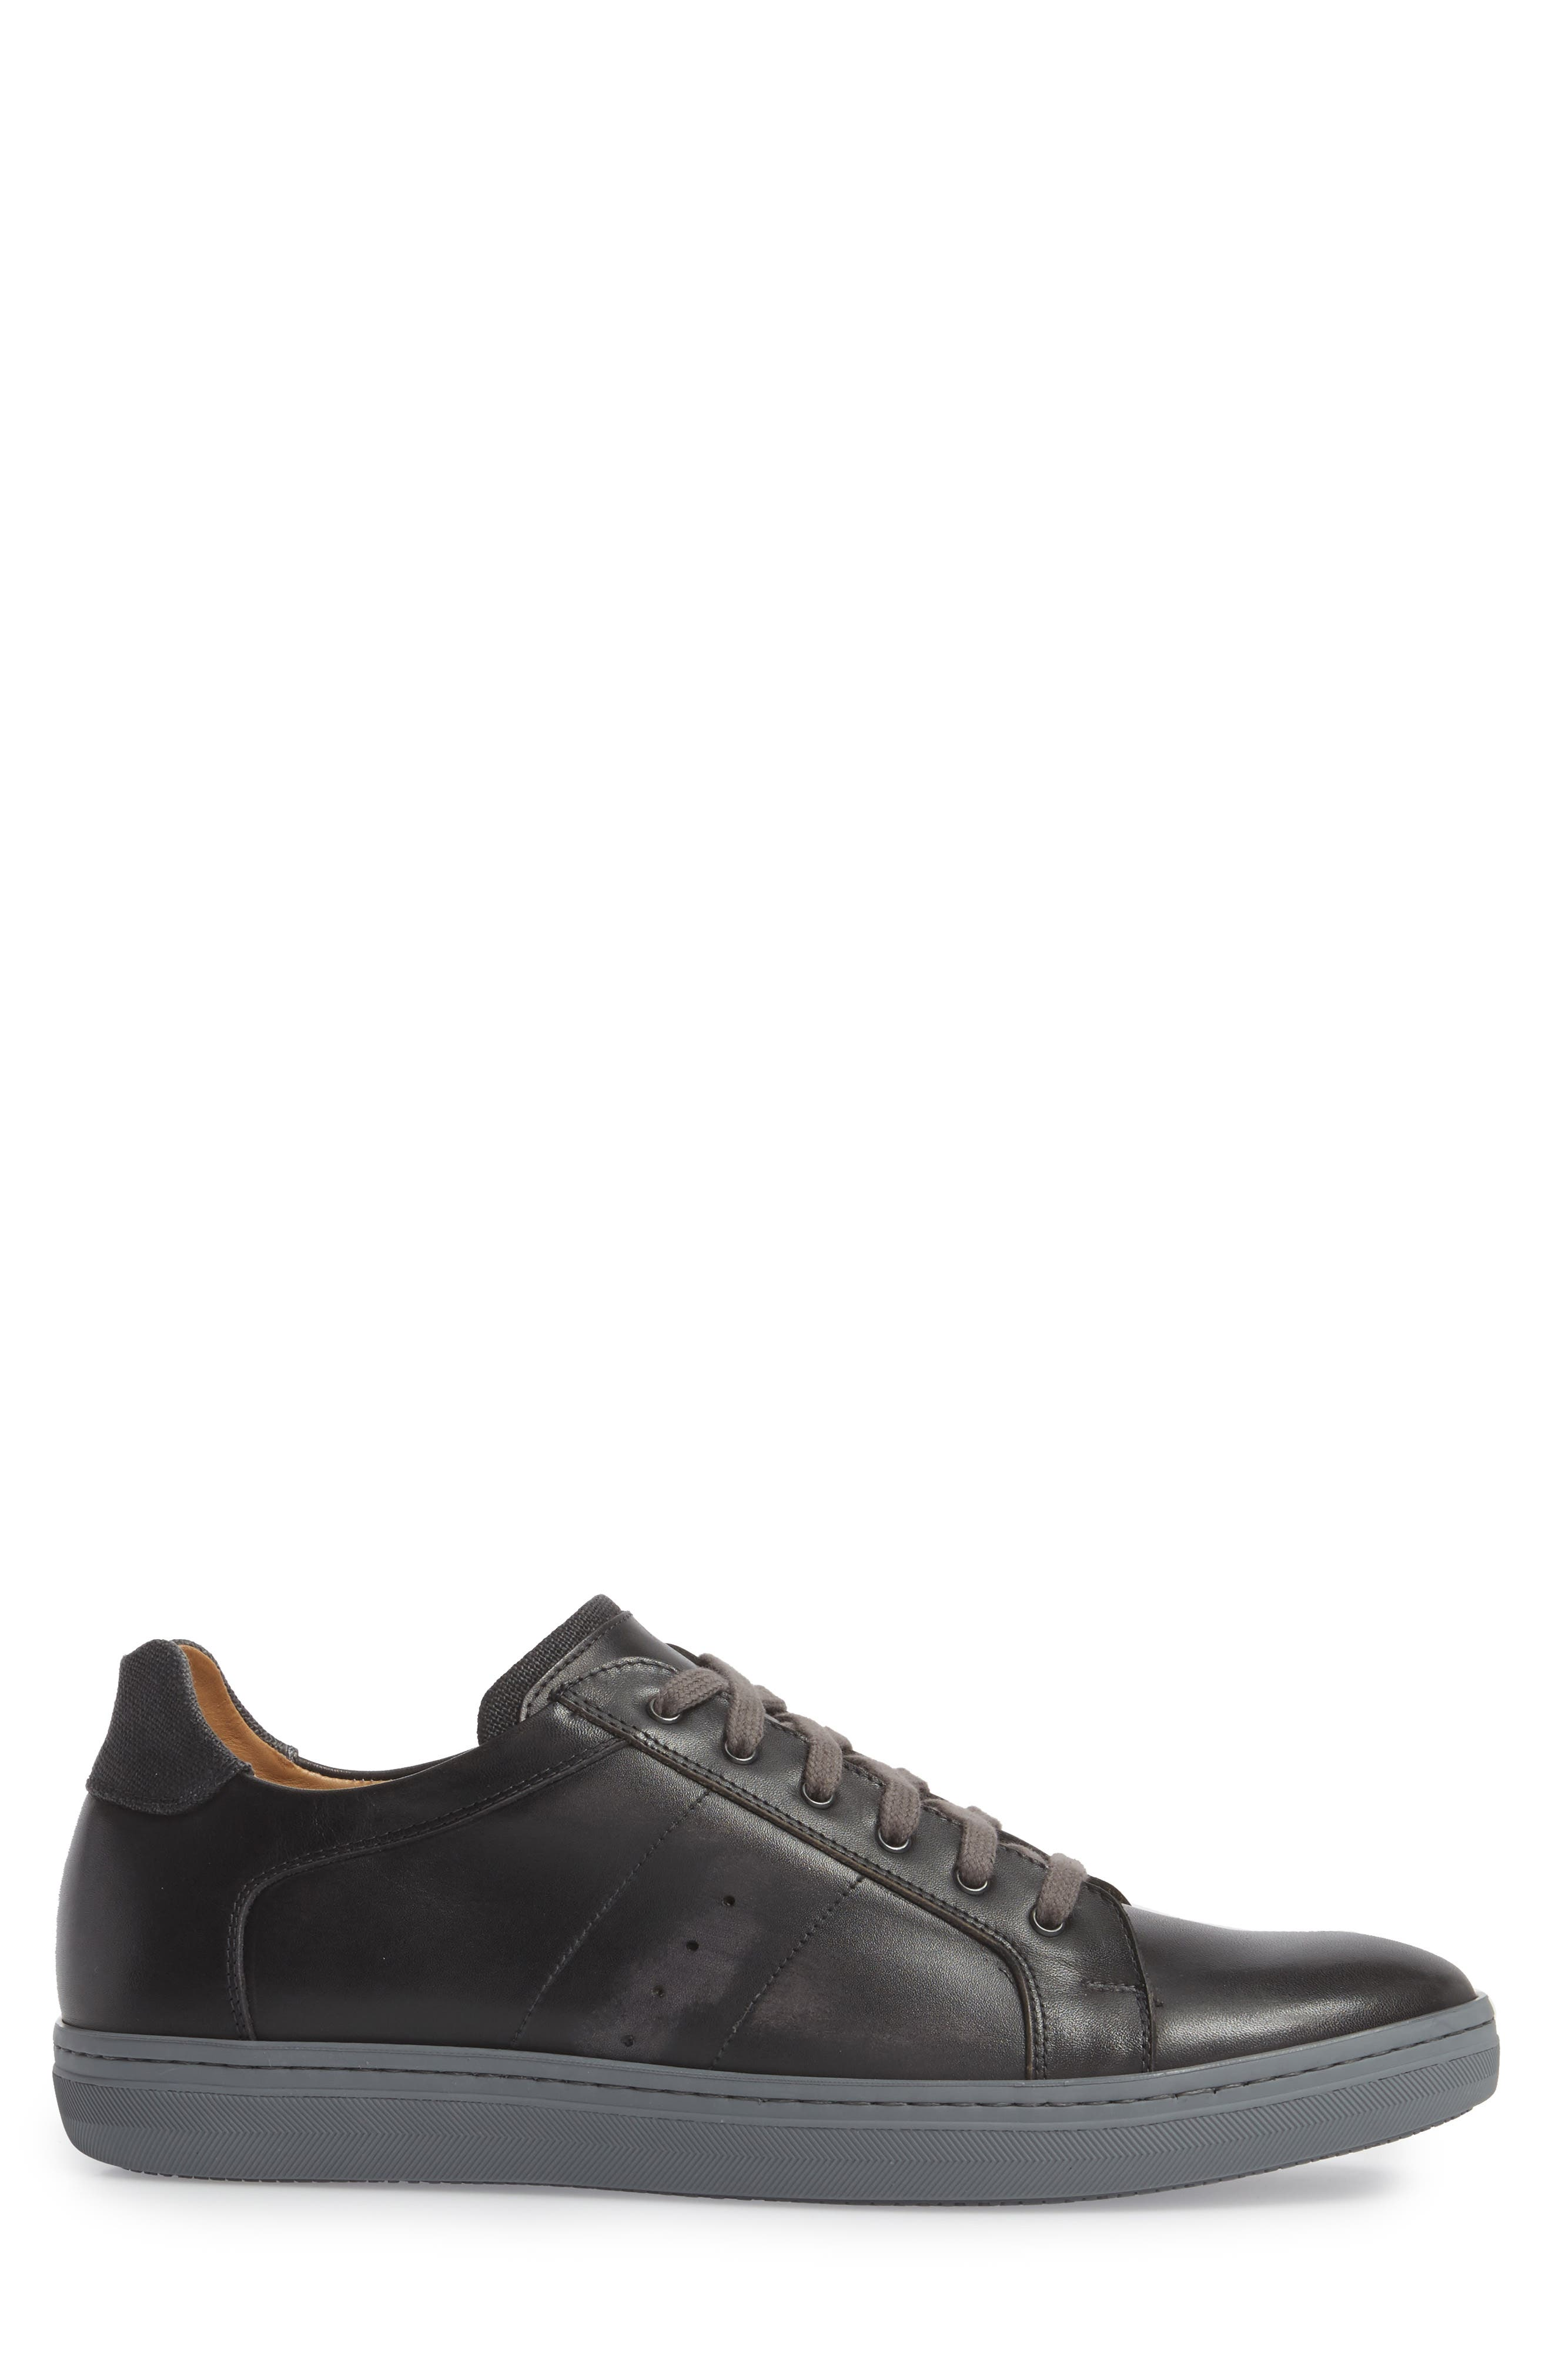 Cuzco Sneaker,                             Alternate thumbnail 3, color,                             GRAPHITE/ BLACK LEATHER